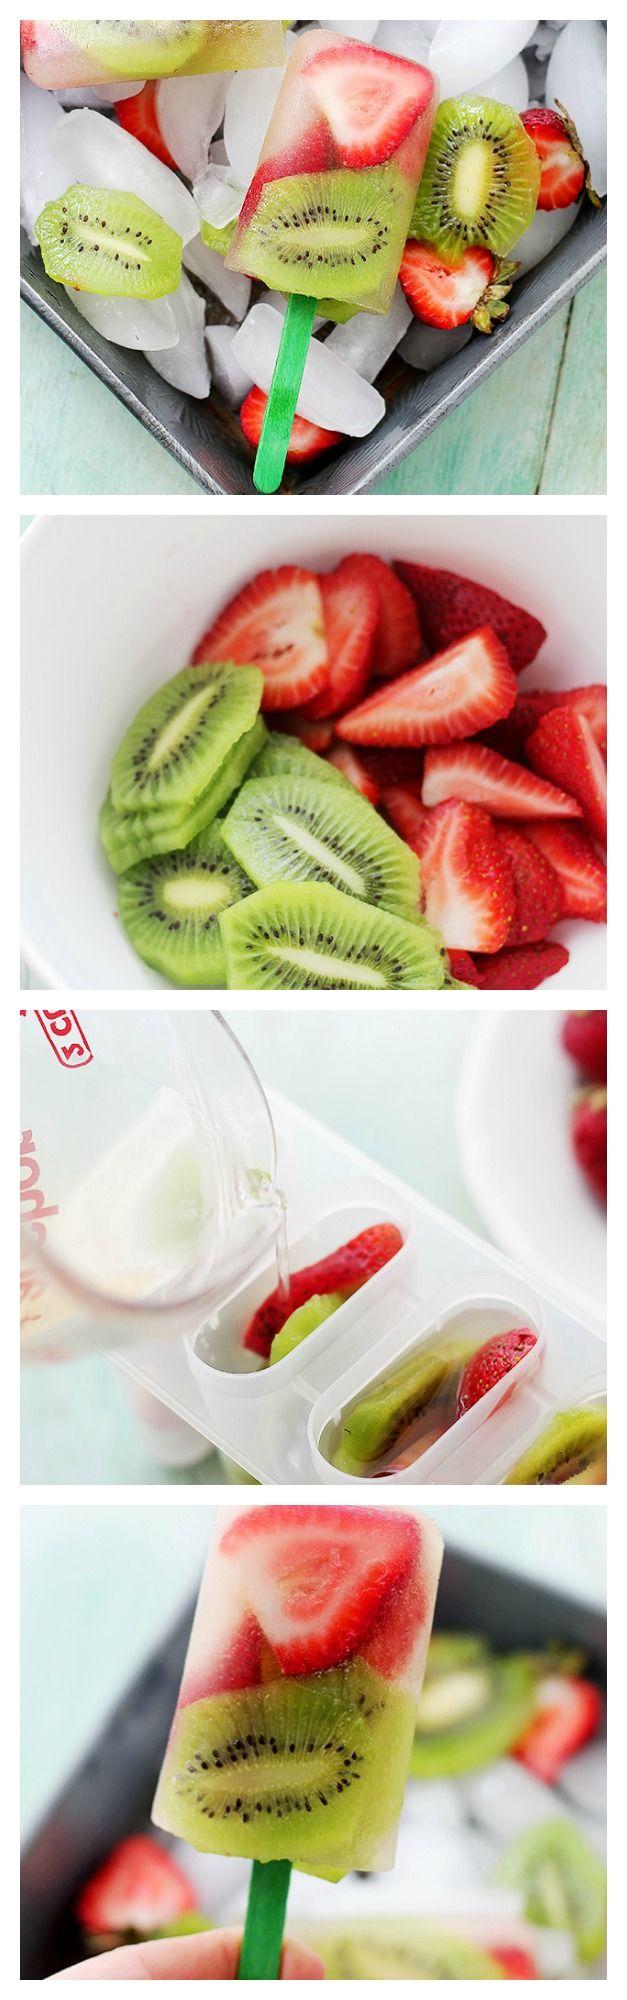 Strawberry Kiwi Popsicles | www.diethood.com | Super easy, delicious ...